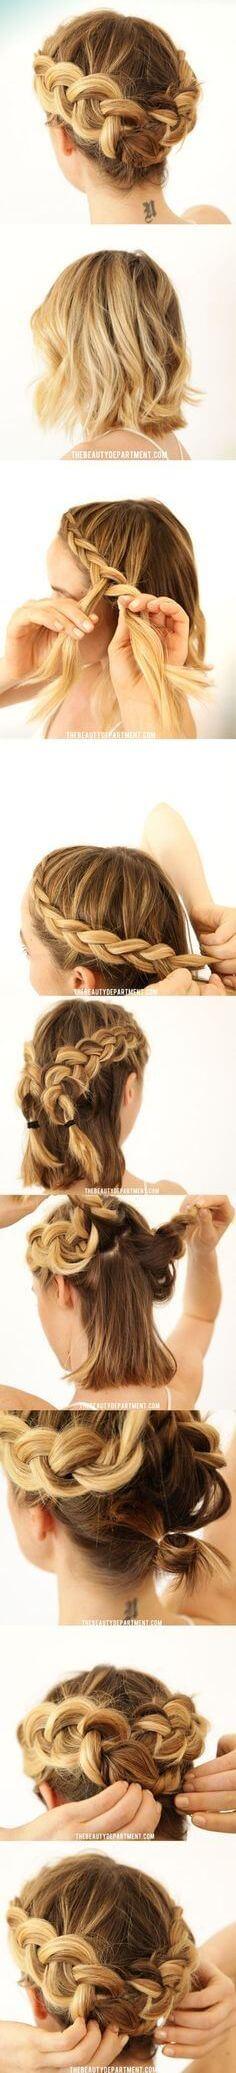 GreekBraidsHairstyle Step by step tutorial Greek hairstyle for short hair (Step by step tutorial)